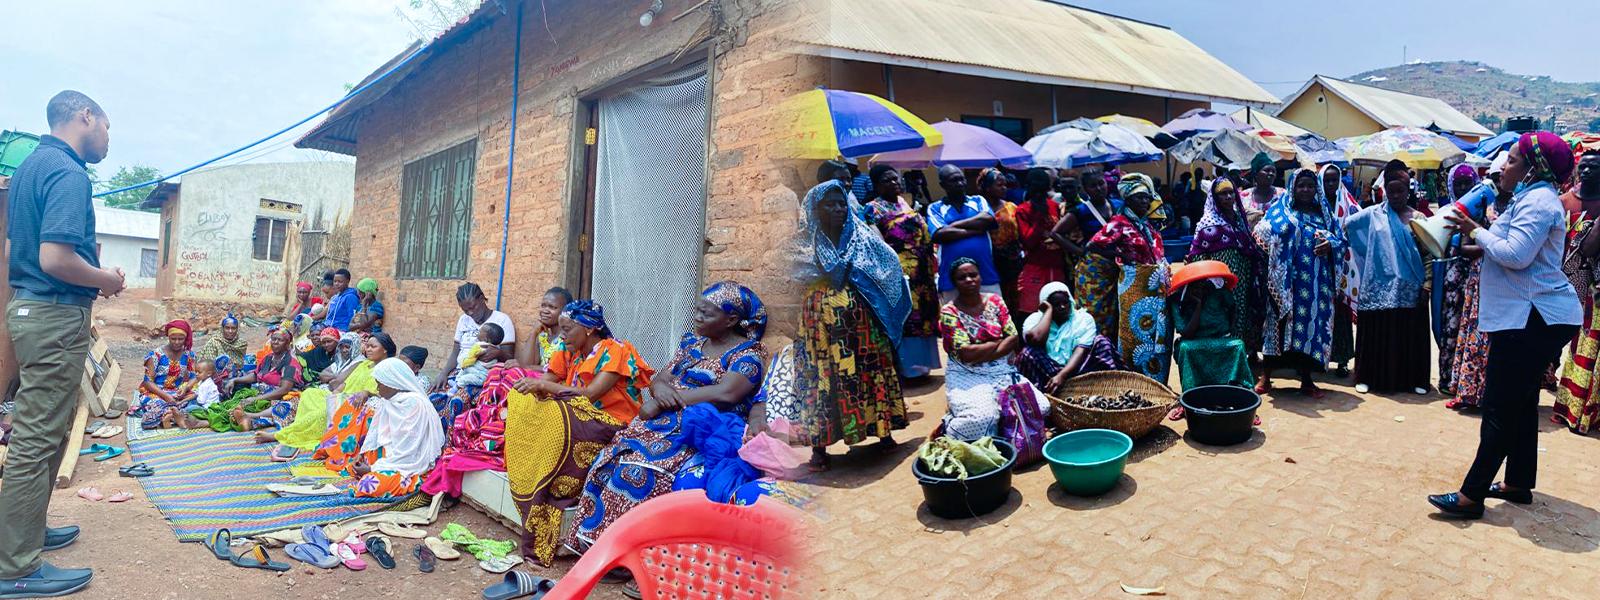 TMDA | Tanzania Medicines & Medical Devices Authority Home